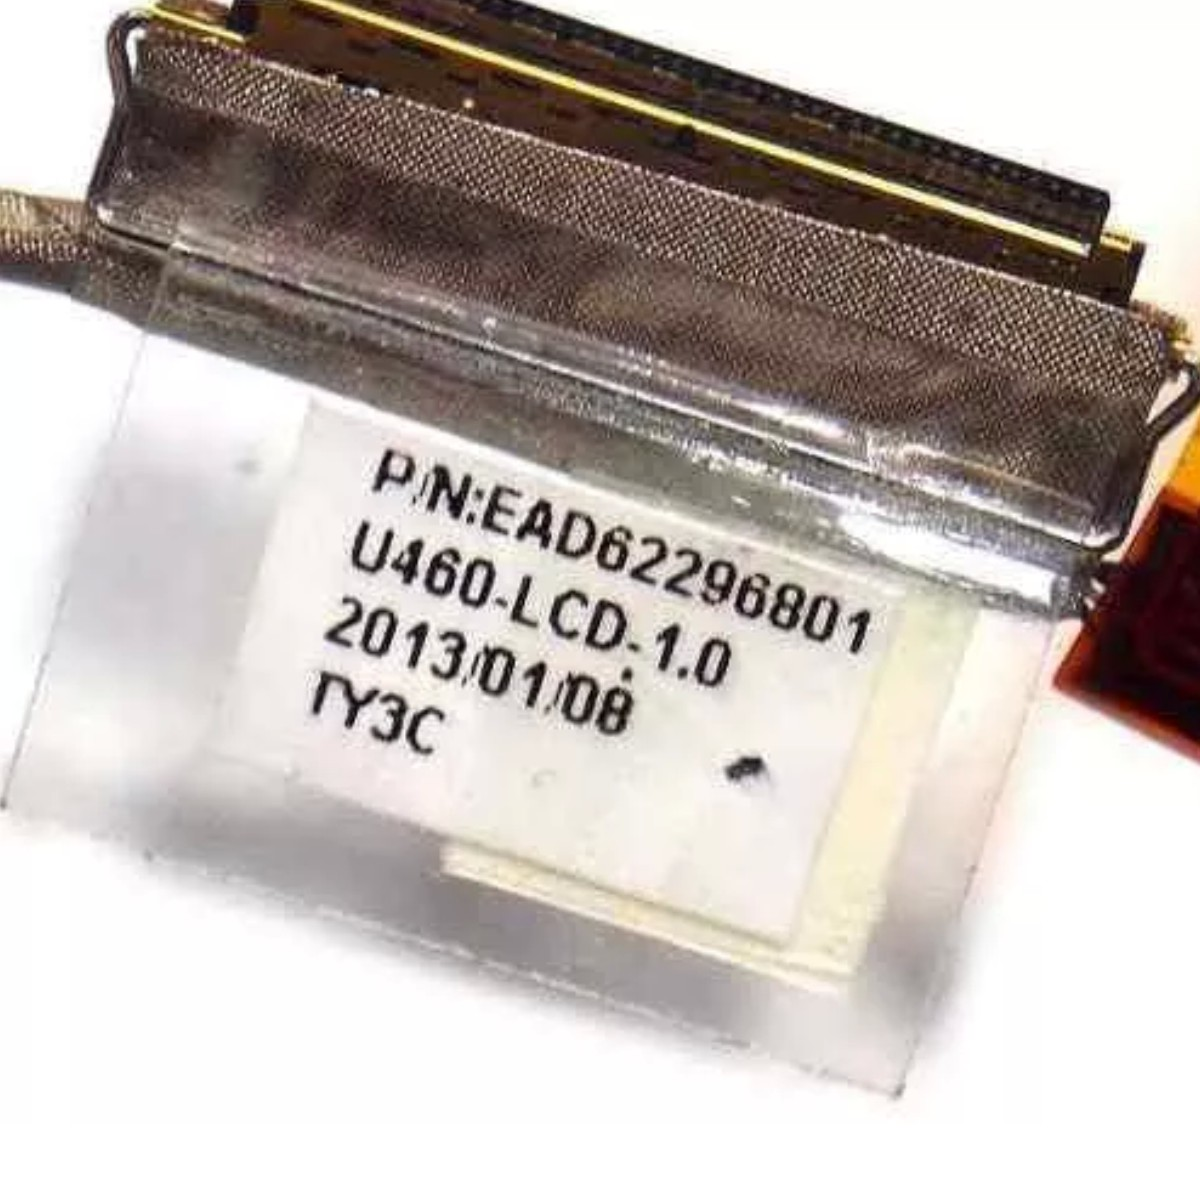 Cabo Flat + Câmera Ultrabook LG U460 Pn: EAD62296801 - Novo